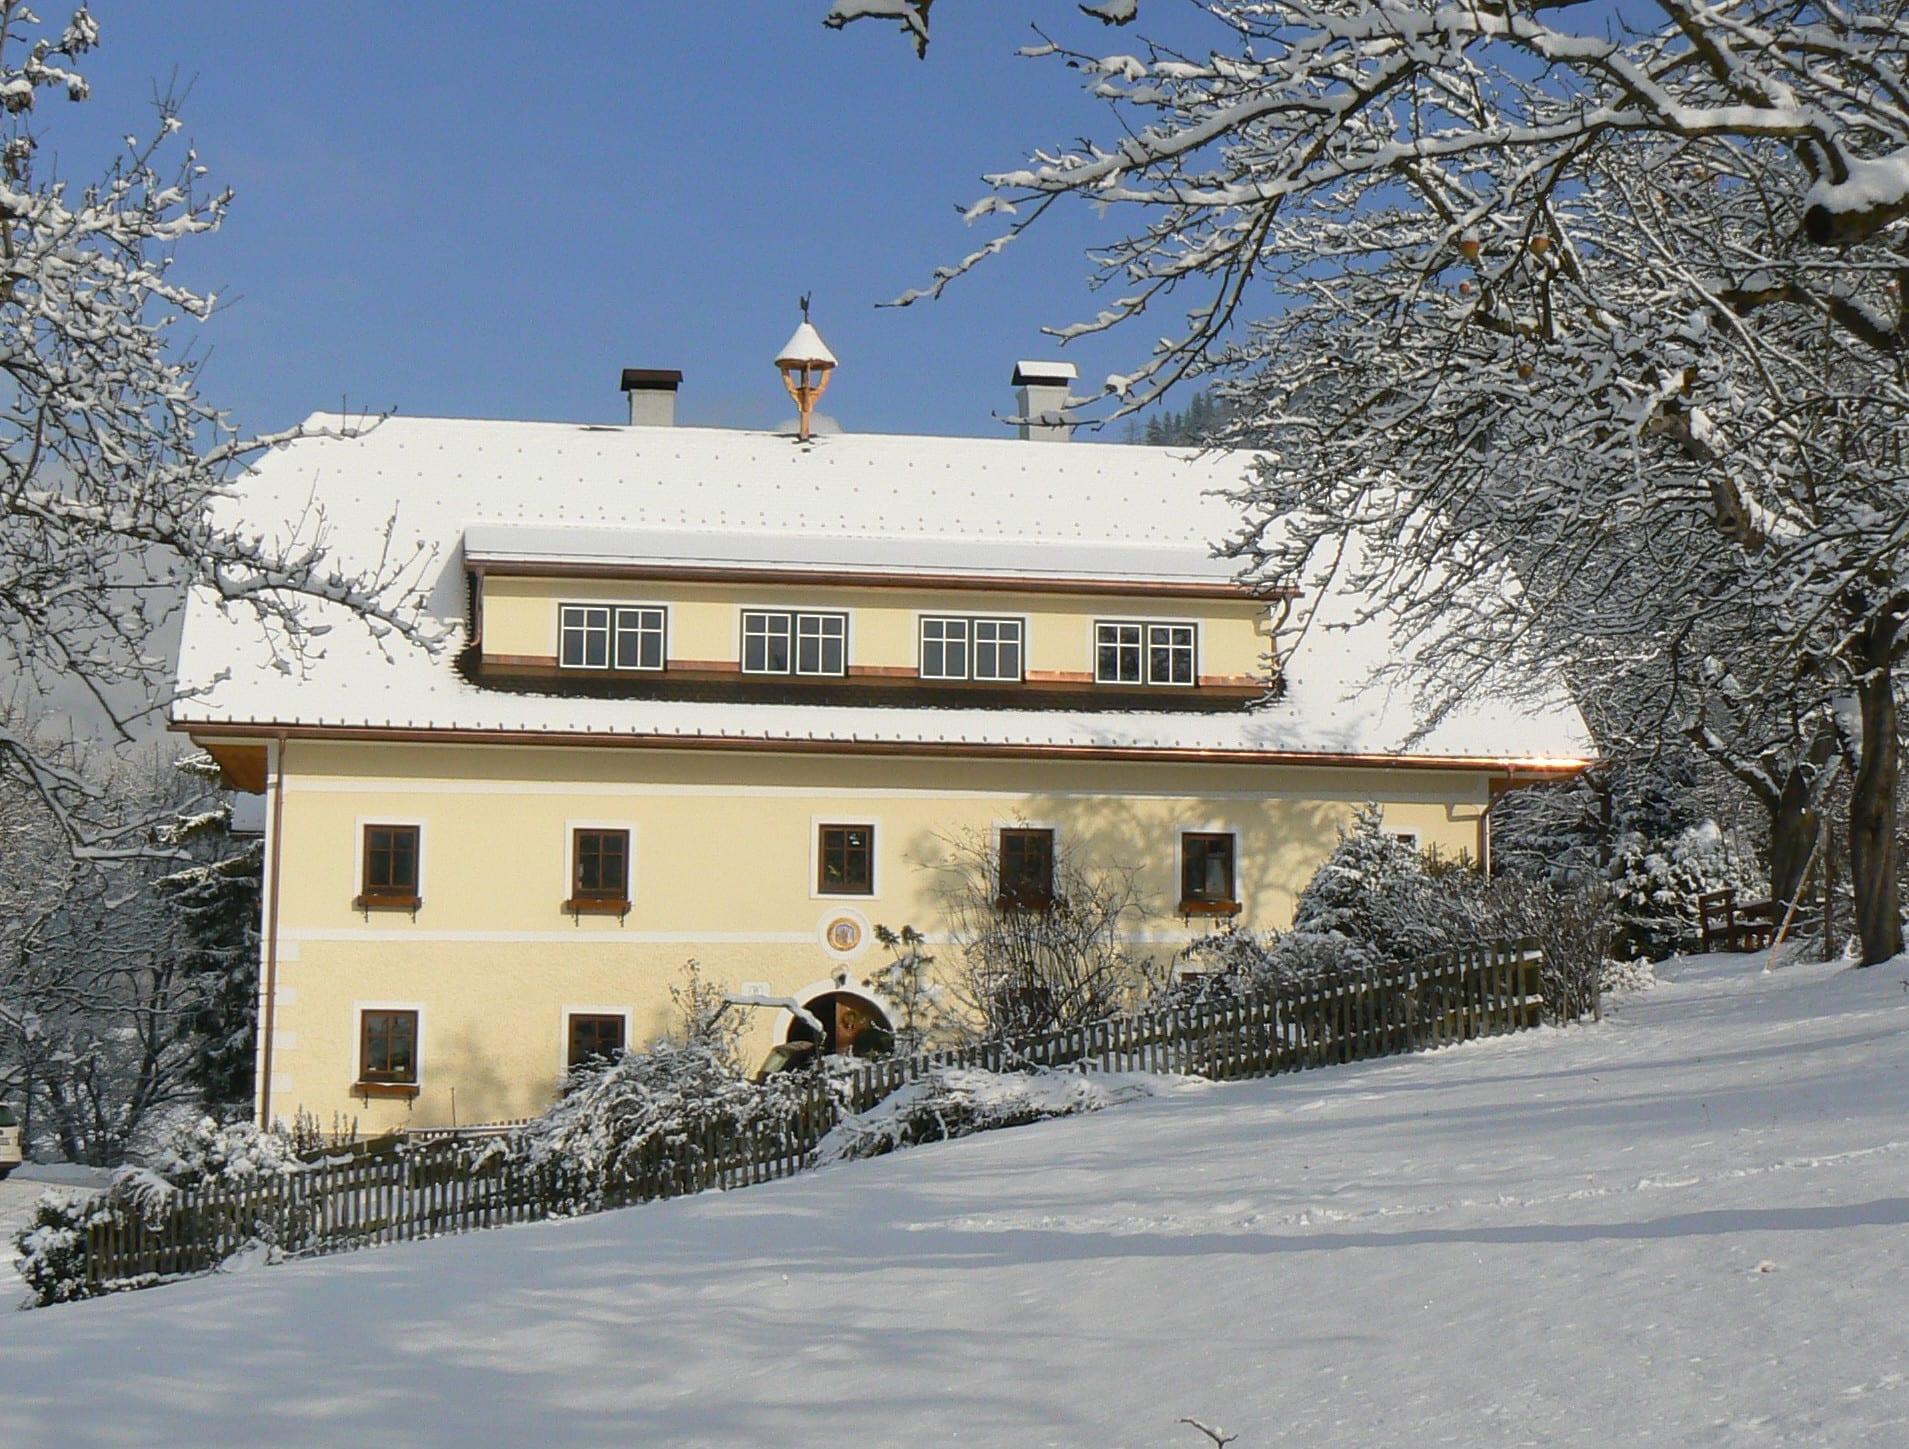 Bauer in Aiglern